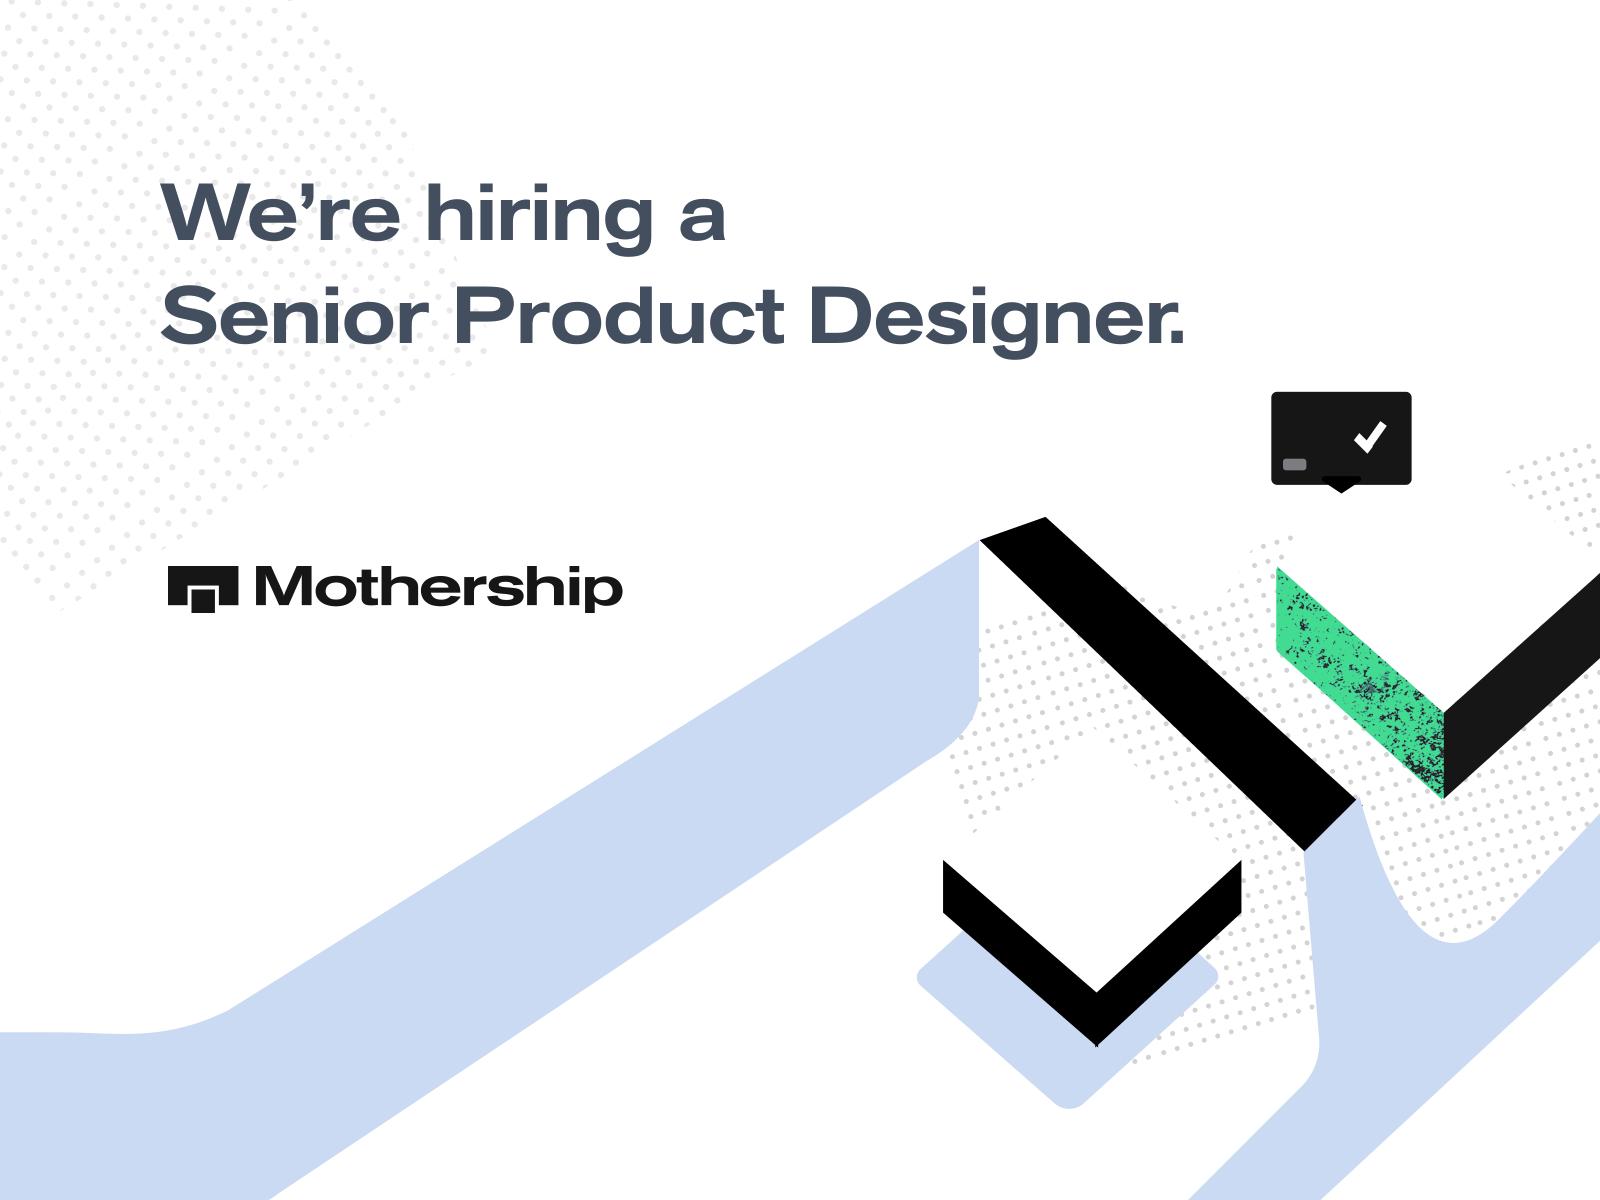 We're Hiring a Senior Product Designer!